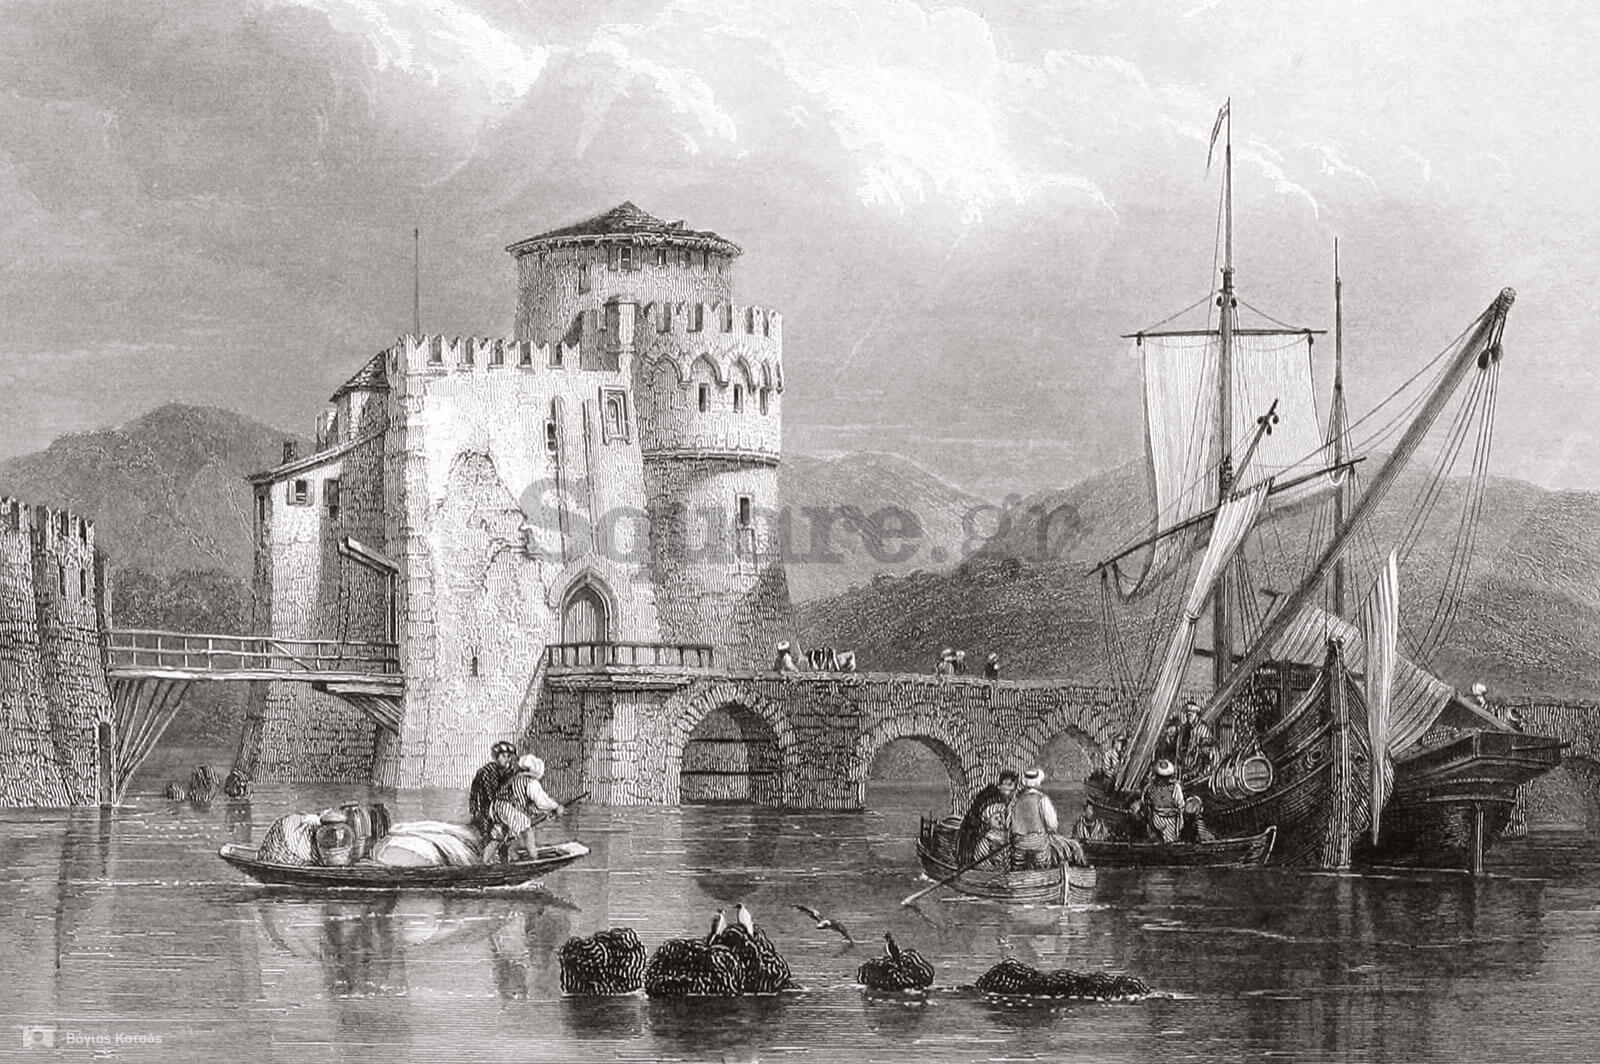 1-William-Finder,-Life-and-works-of-Lord-Byron,-1833-Γιάννης-Καράκωστας-Χαρακτικά-της-Εύβοιας